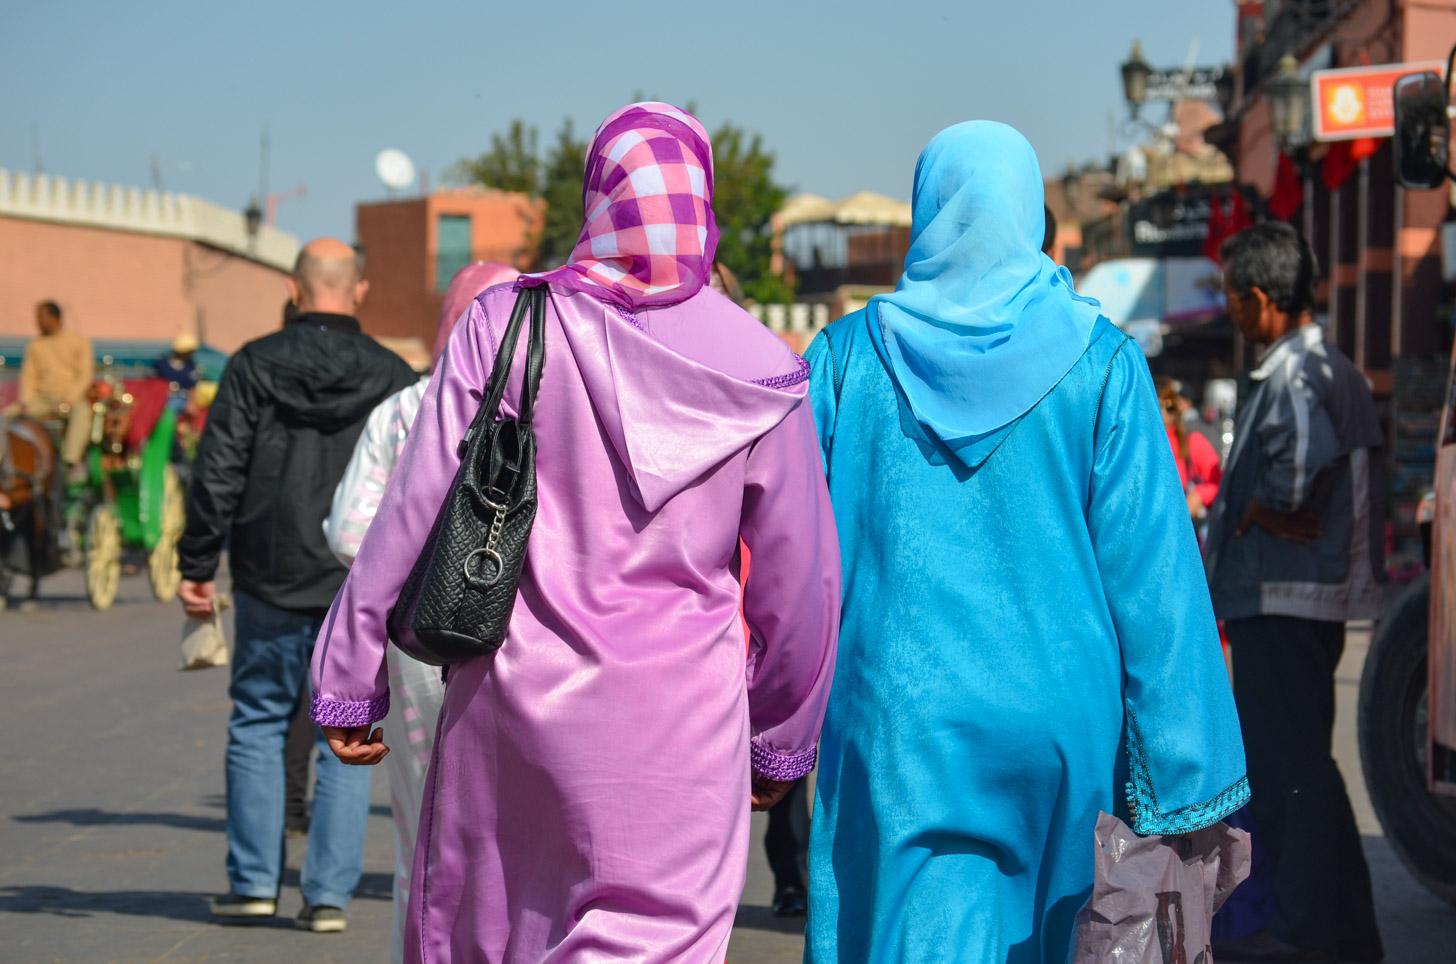 Conservatieve kleding in Marrakech